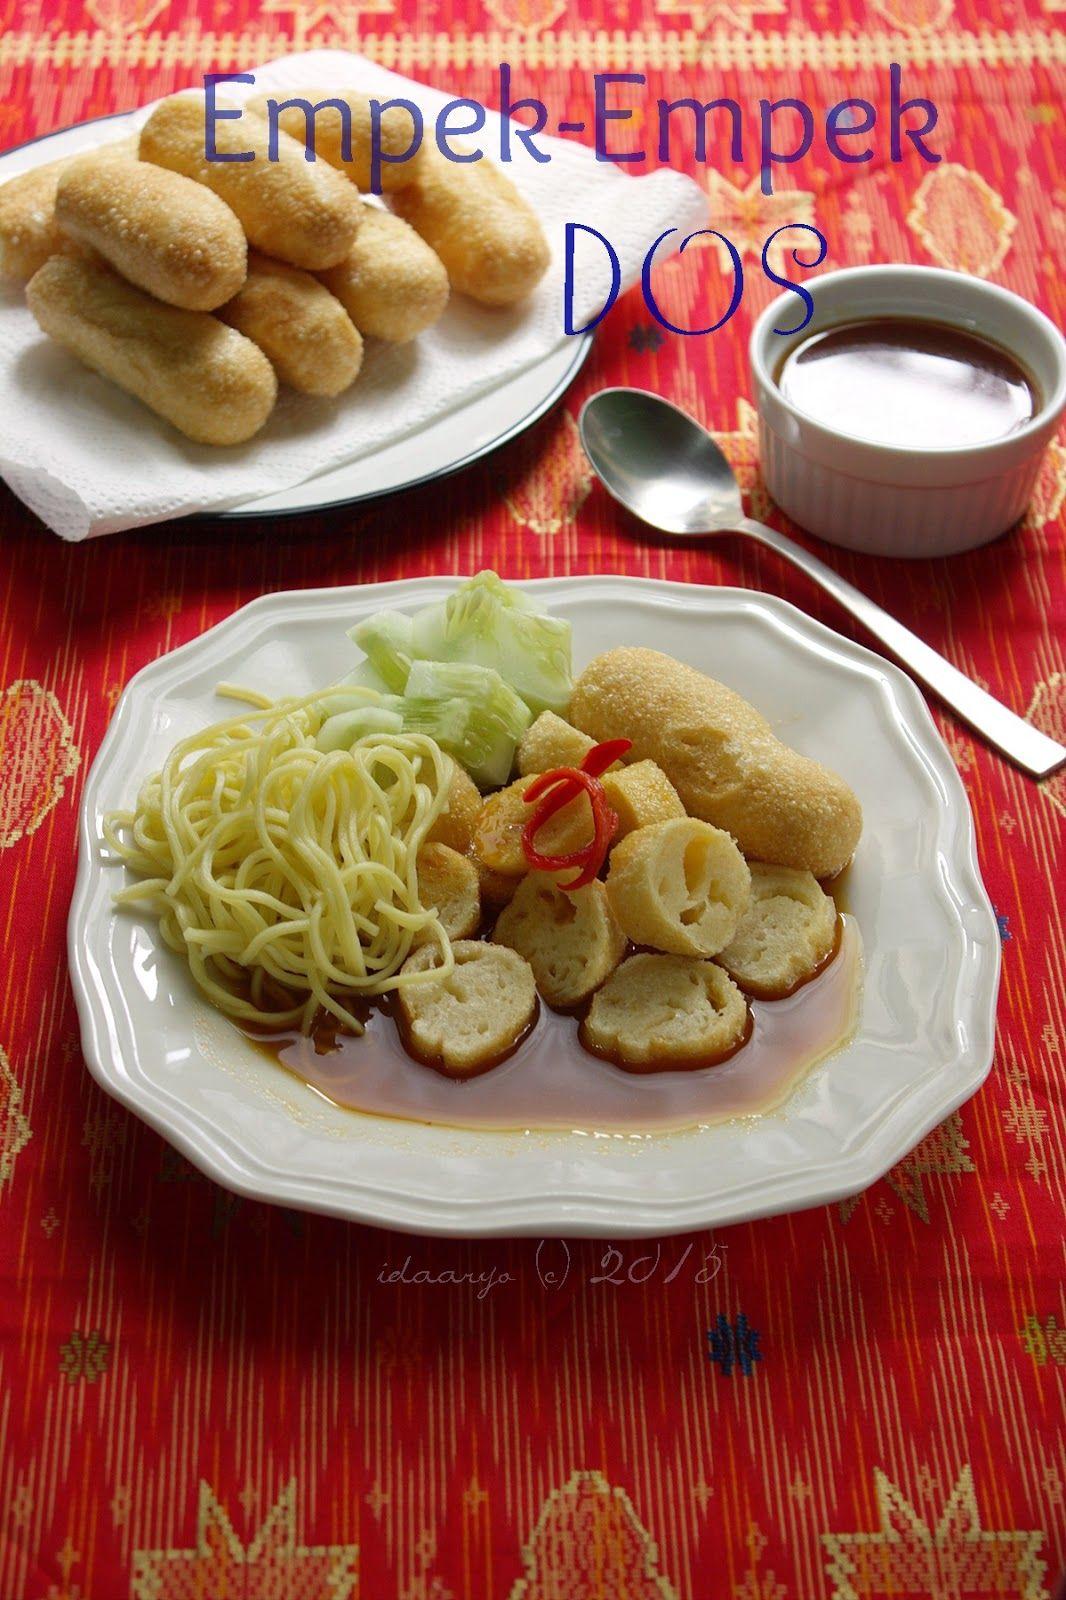 Ida S Homemade Empek Empek Dos Empek Empek Tanpa Ikan A La Widy Resep Makanan Resep Masakan Asia Resep Masakan